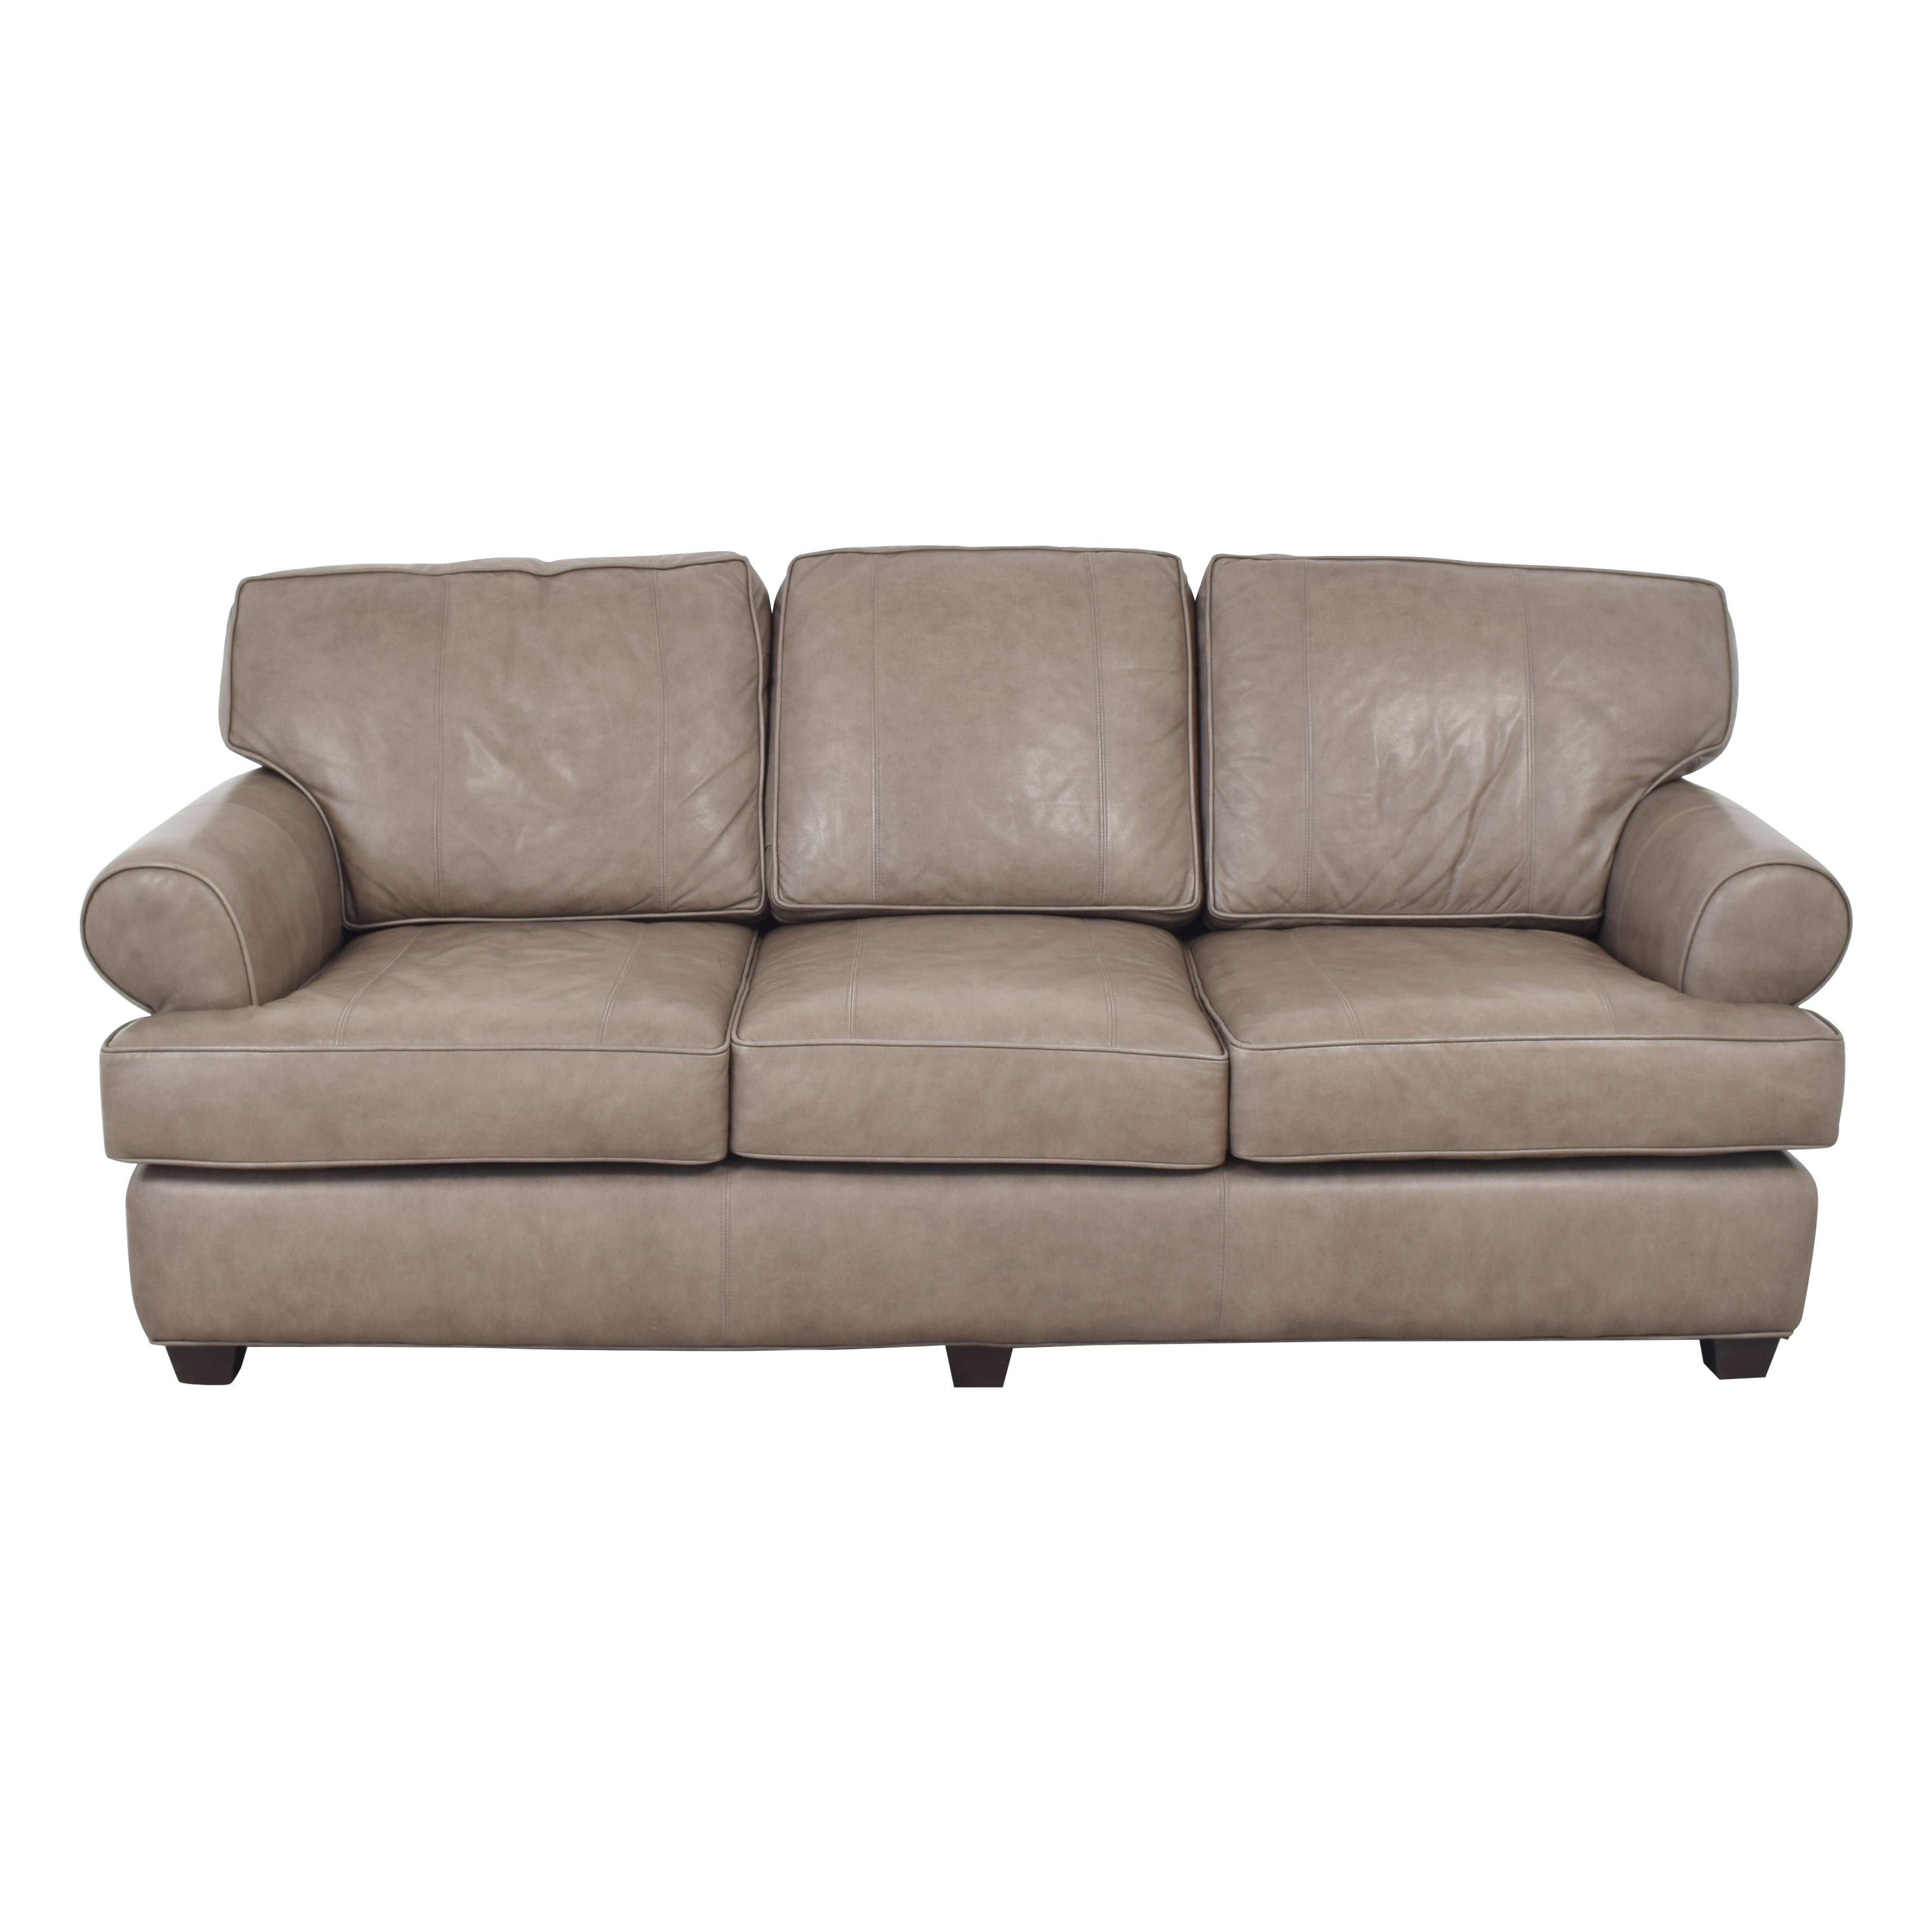 Arhaus Arhaus Hadley Sofa Sofas